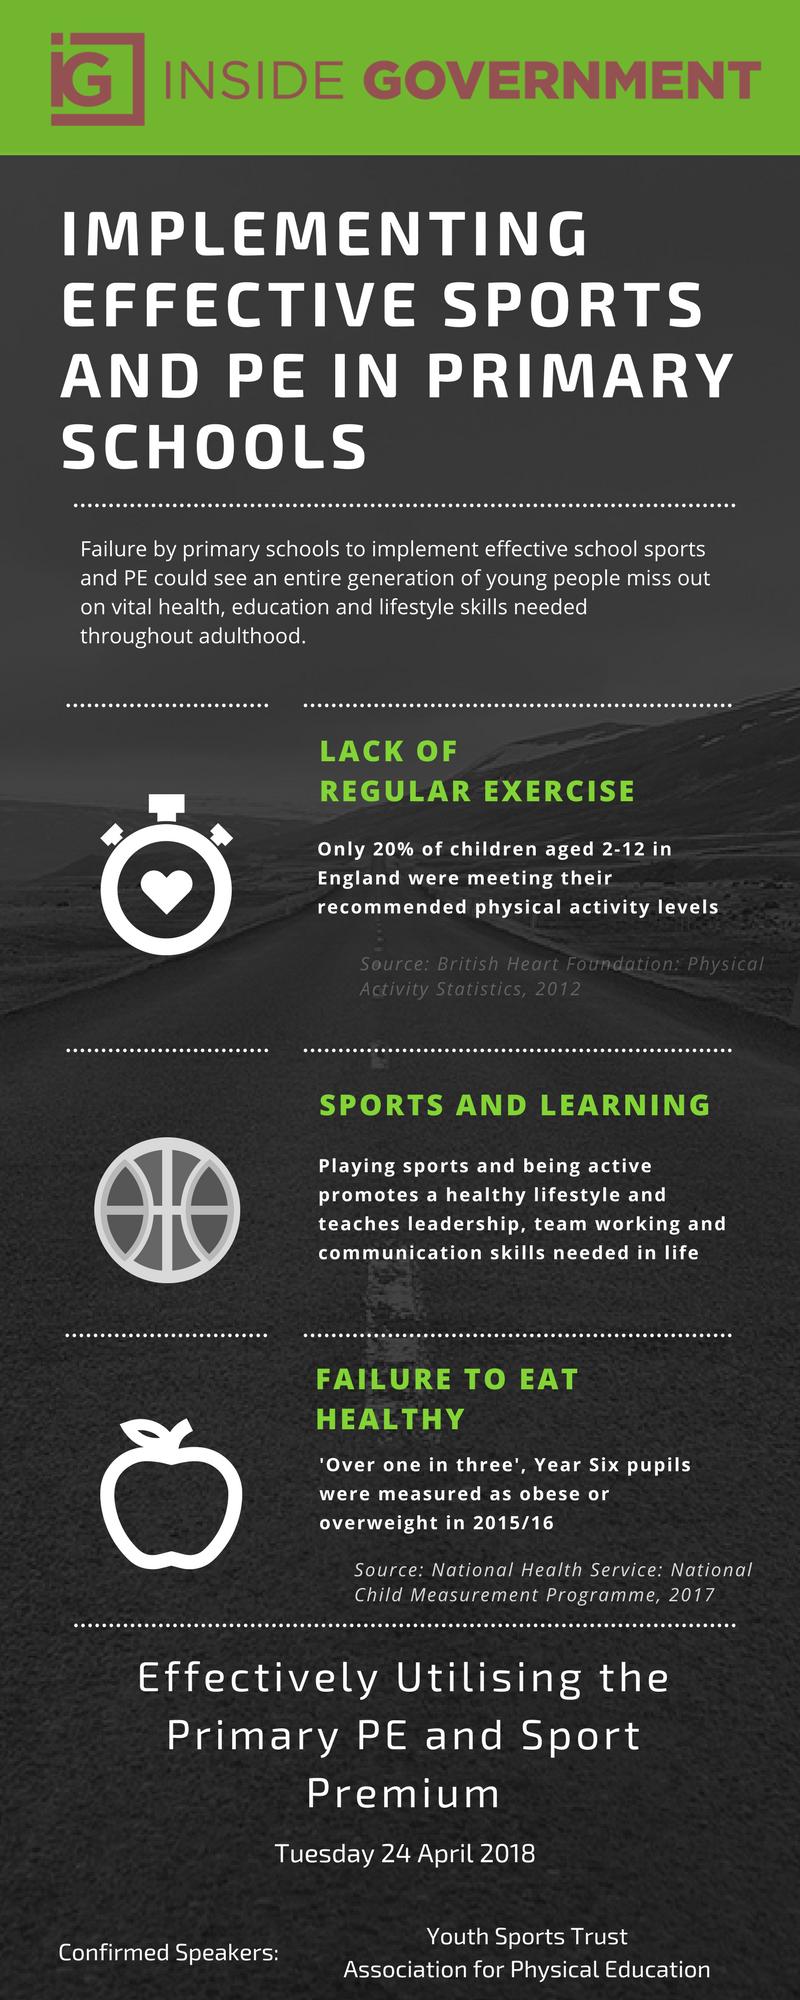 Effectively Utilising the Primary PE and Sport Premium